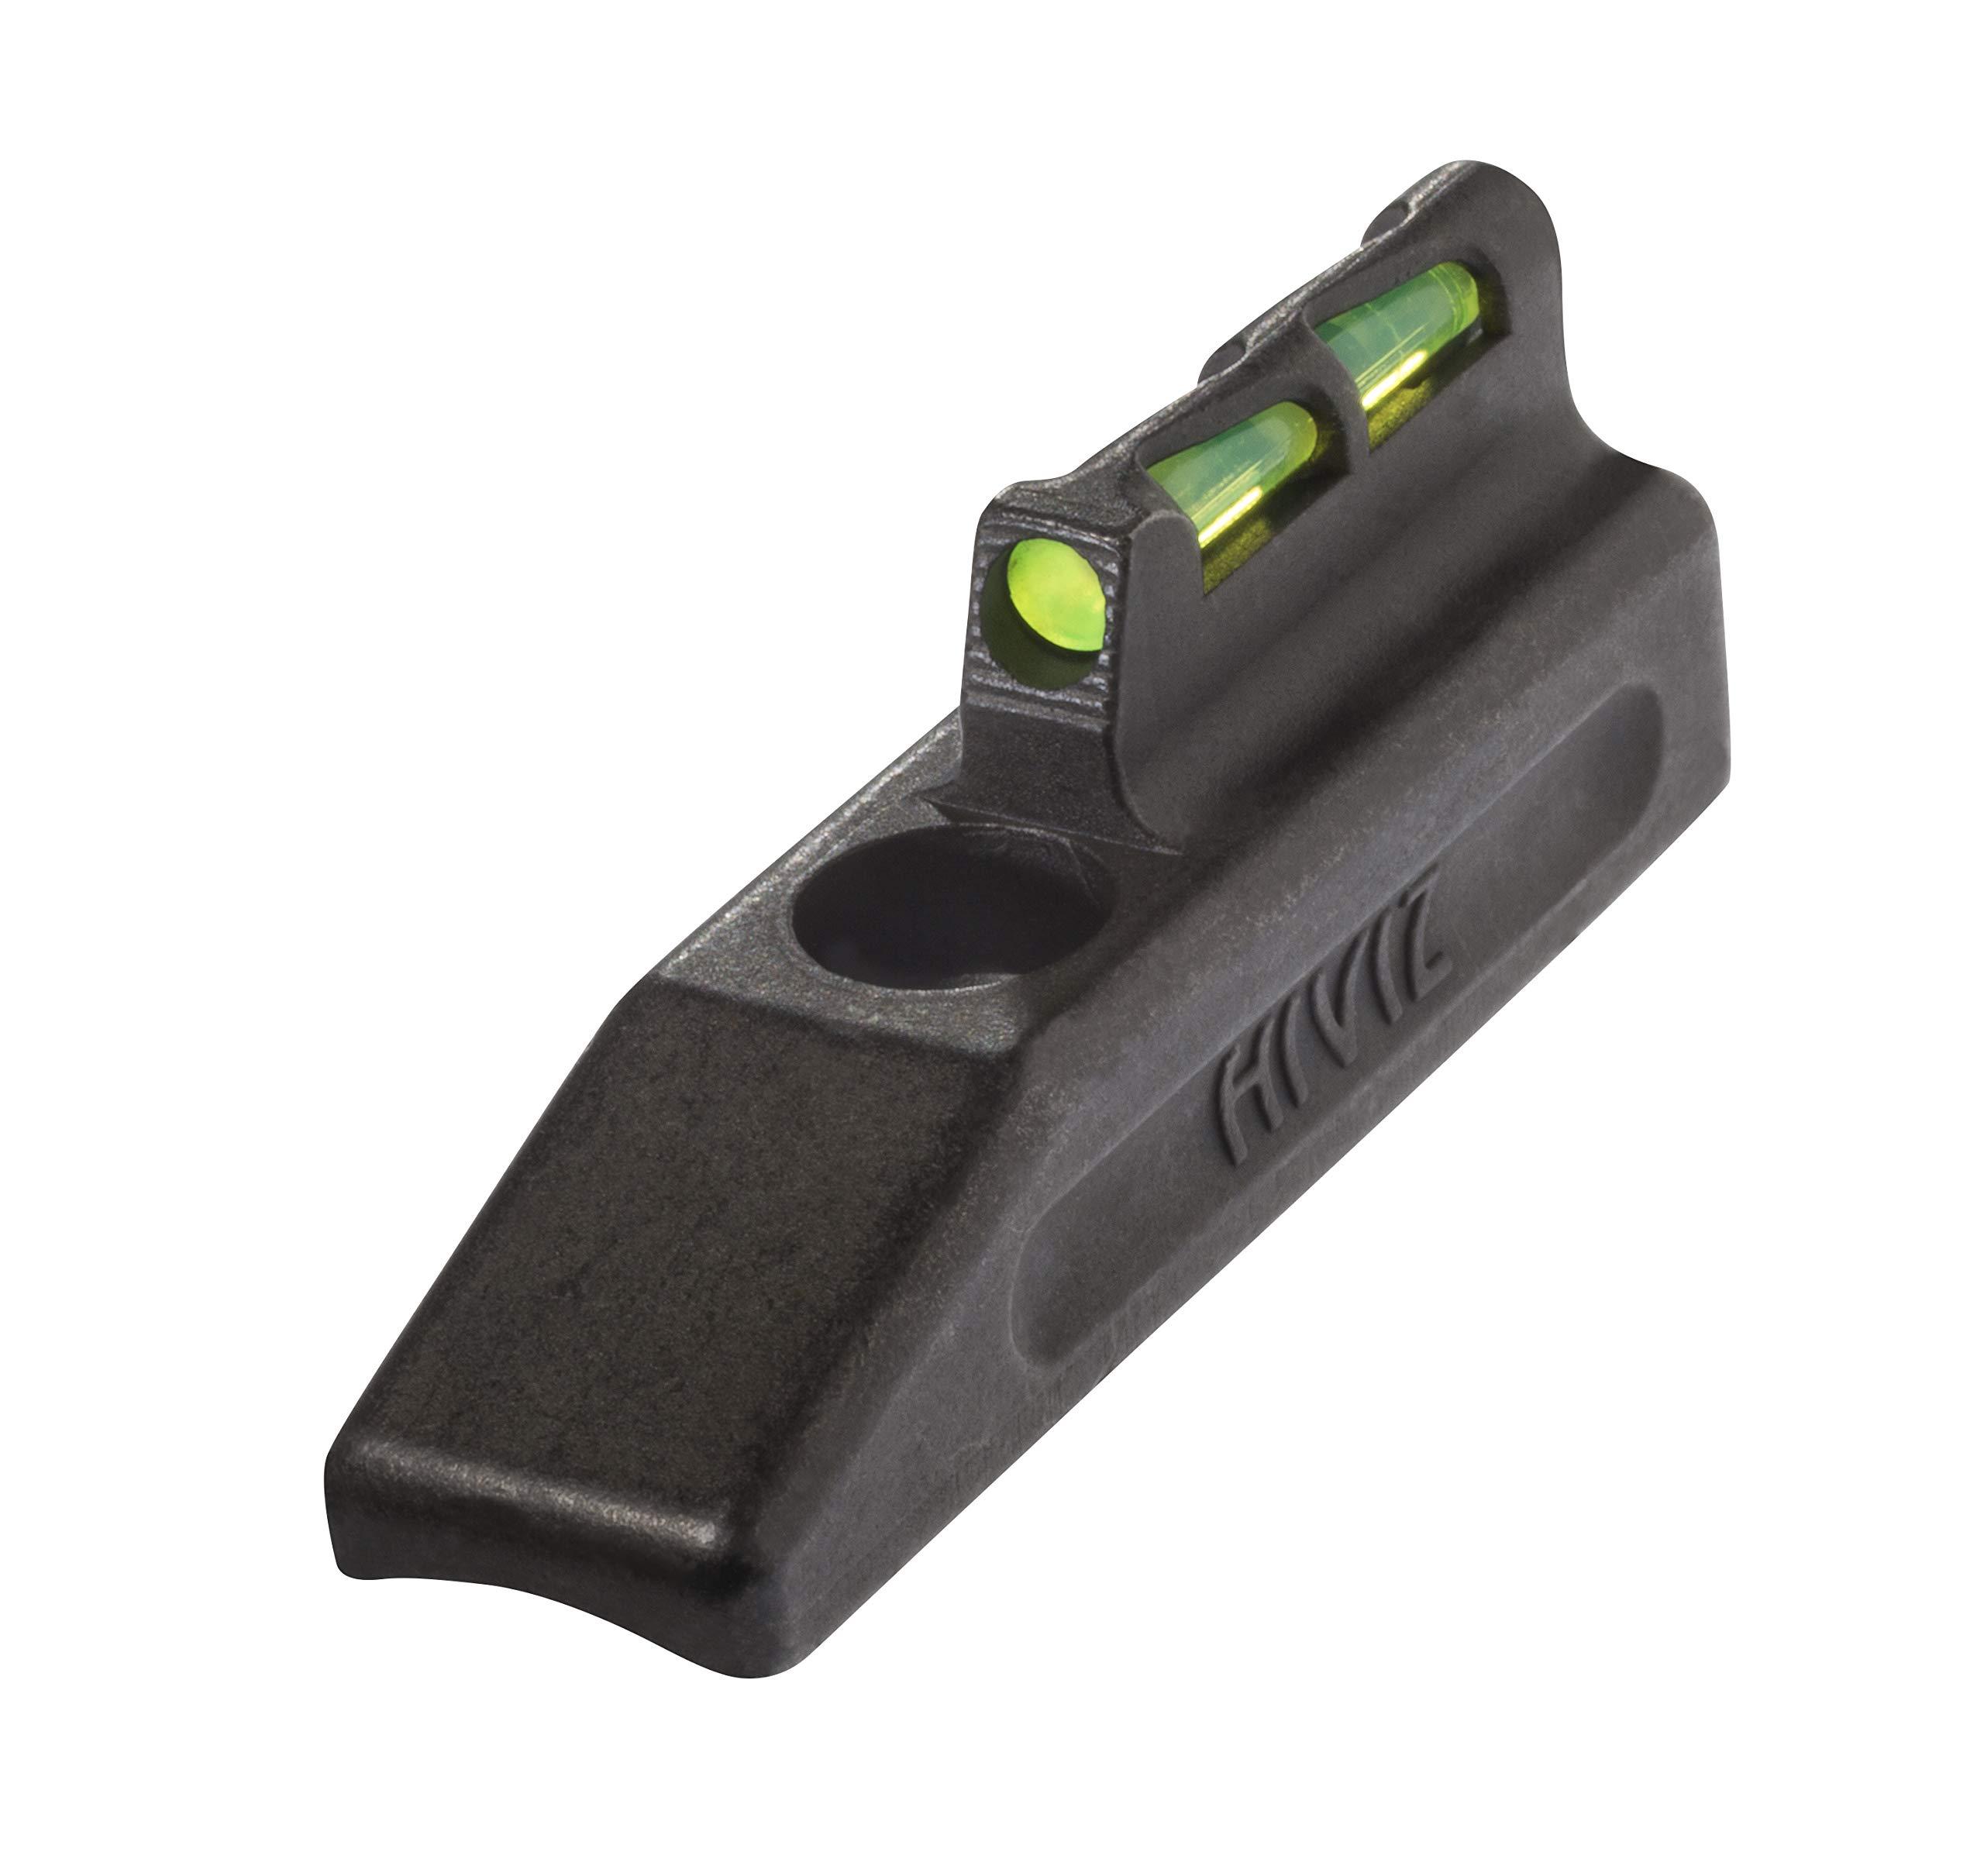 HIVIZ HRBLW01 Ruger Mark II and Mark III Interchangeable LITEWAVE Front Handgun Sight by HIVIZ